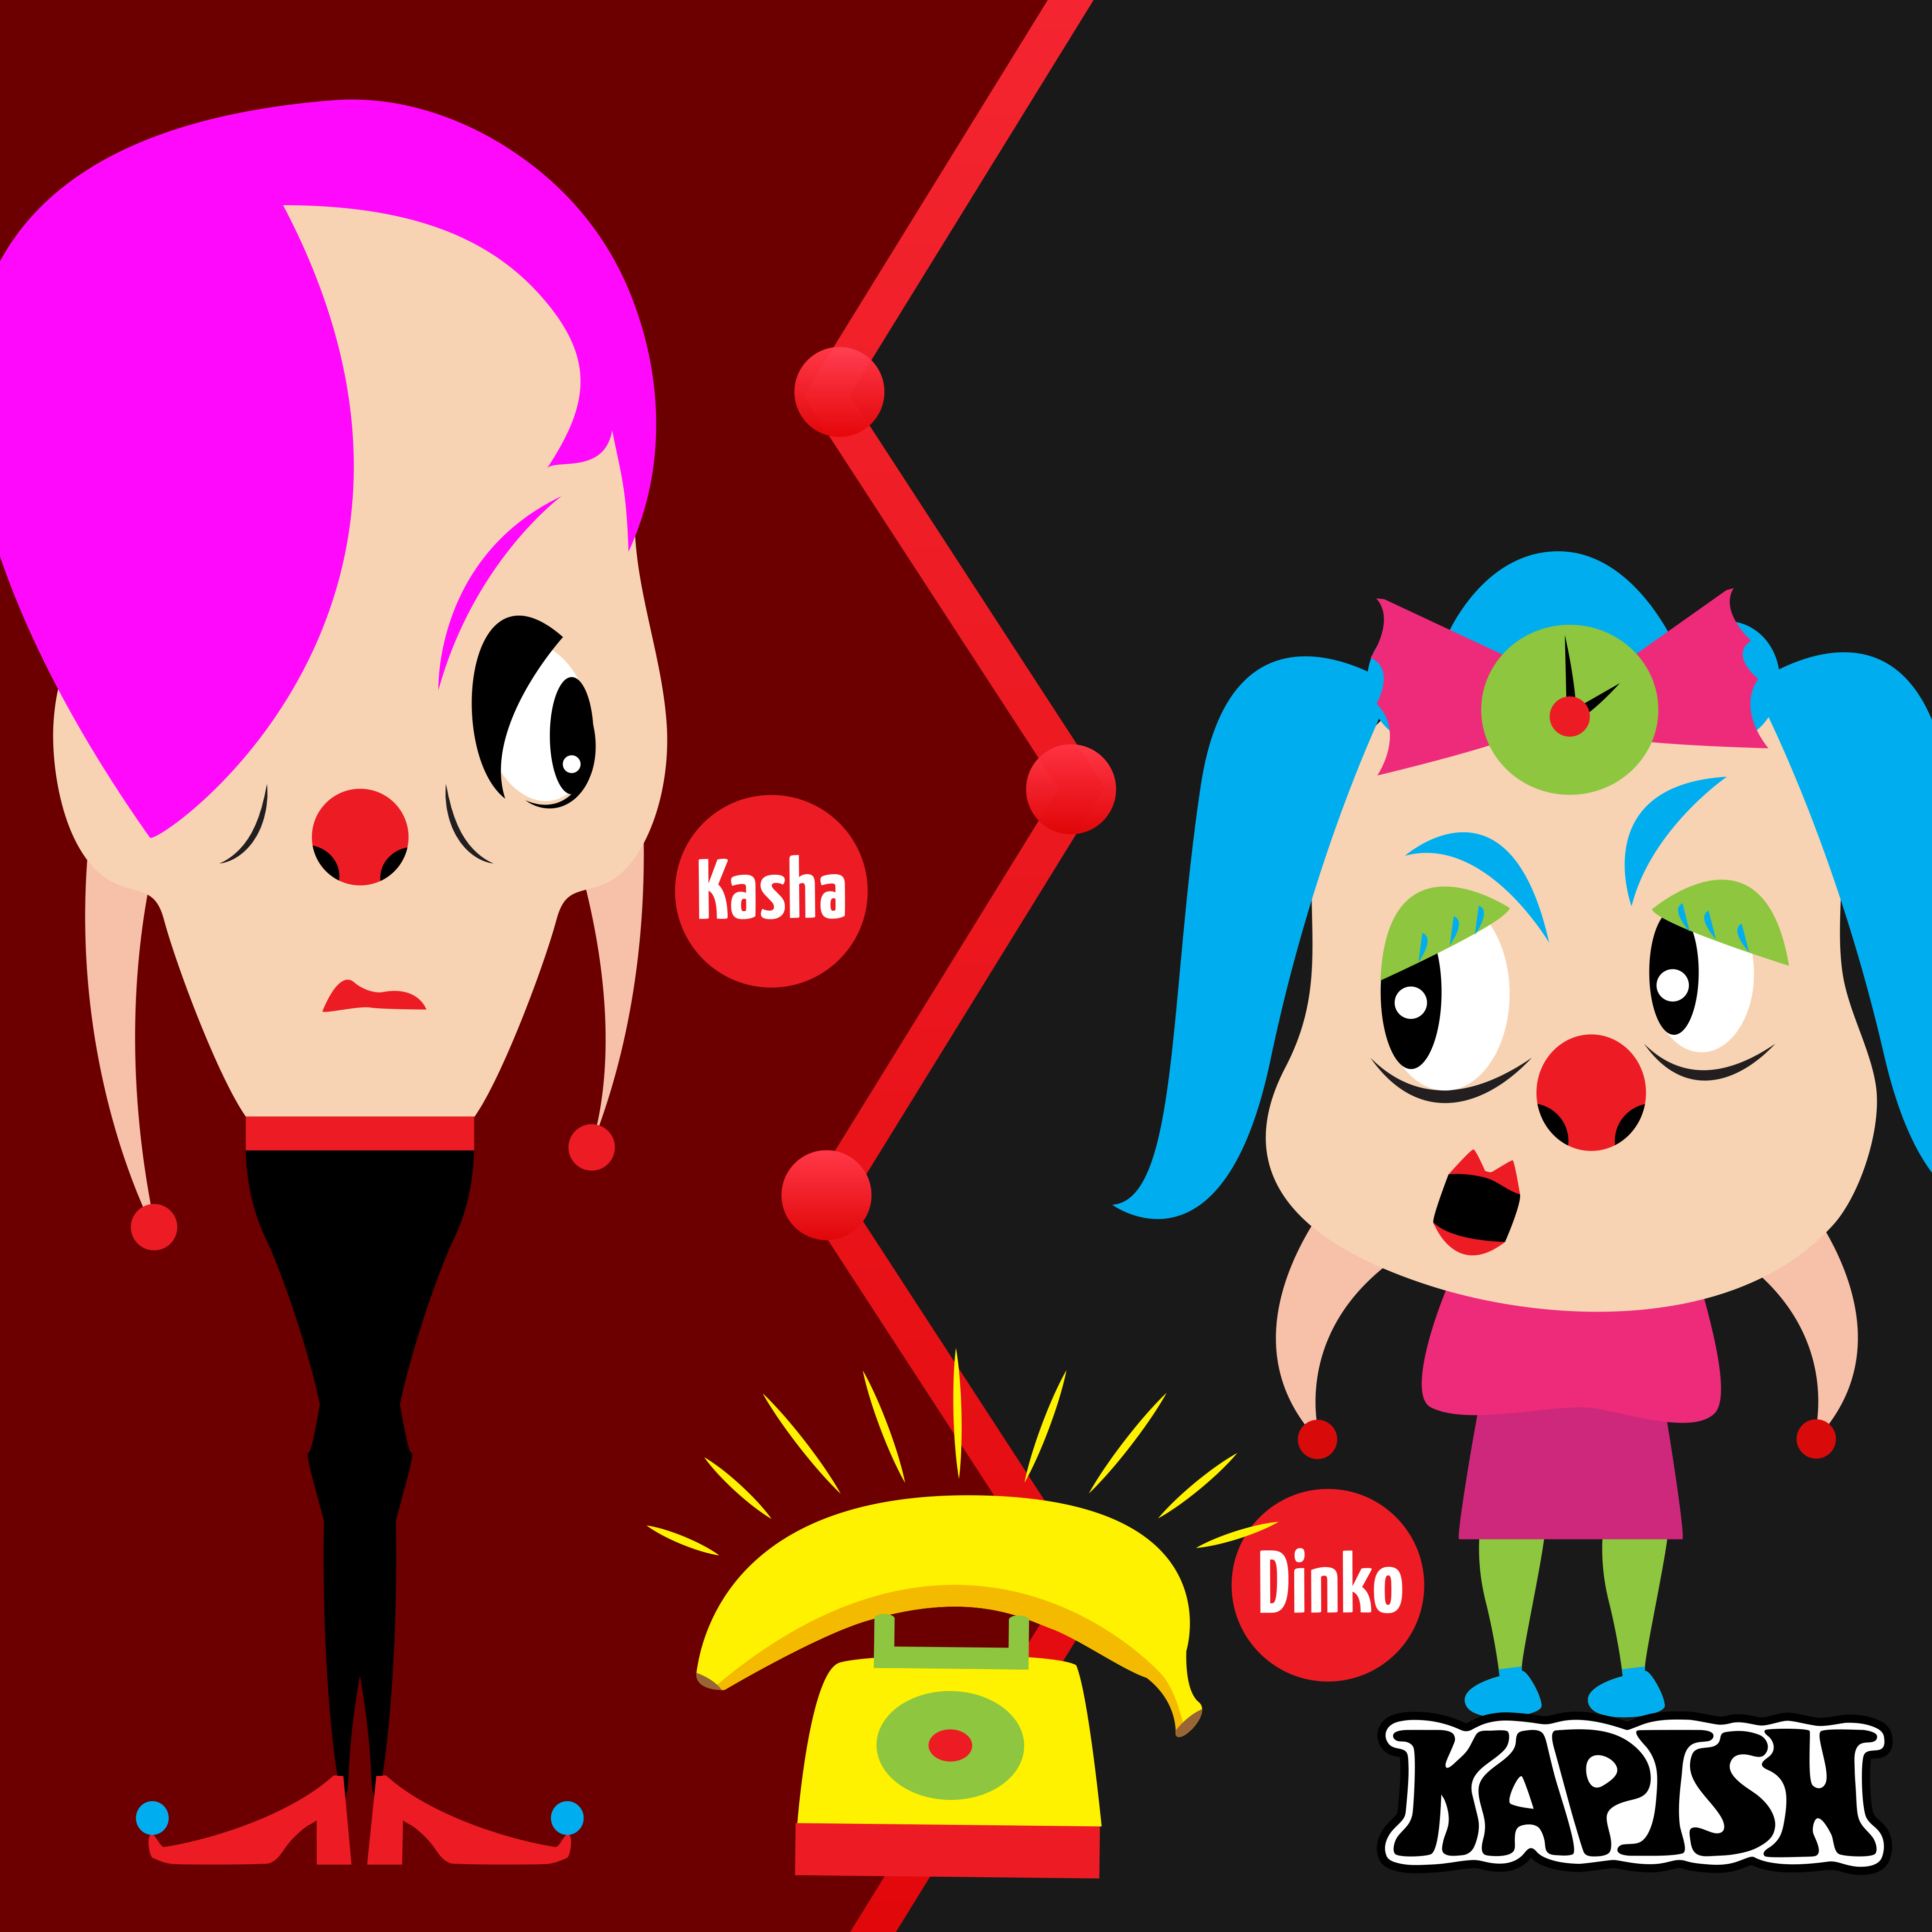 Kapish - Dinko and Kasha